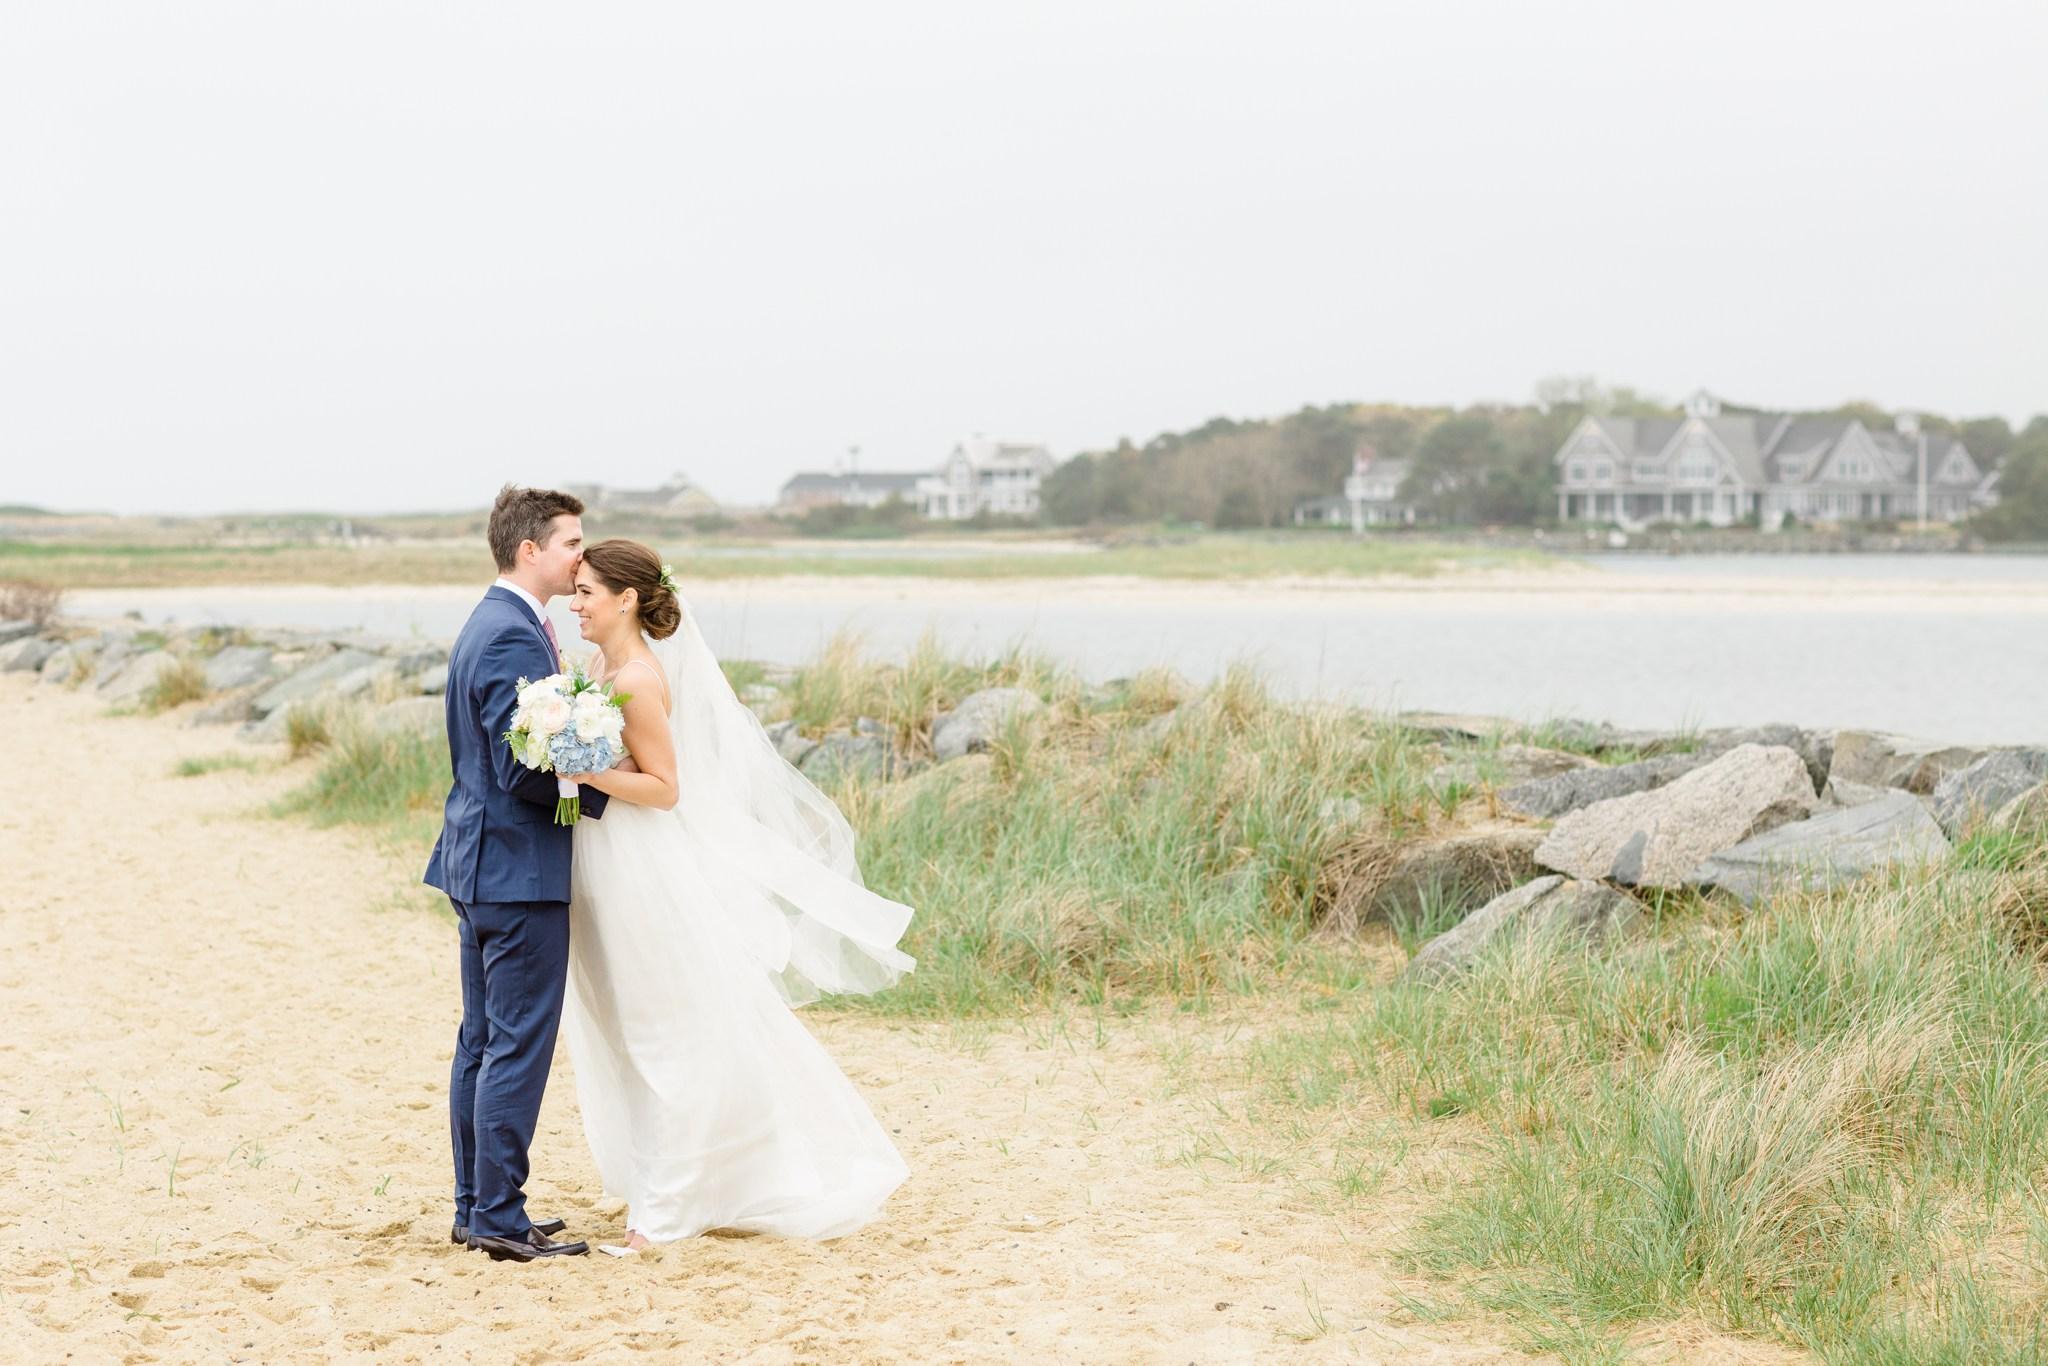 cape_cod_wedding_deborah_zoe_Photography_00033.JPG